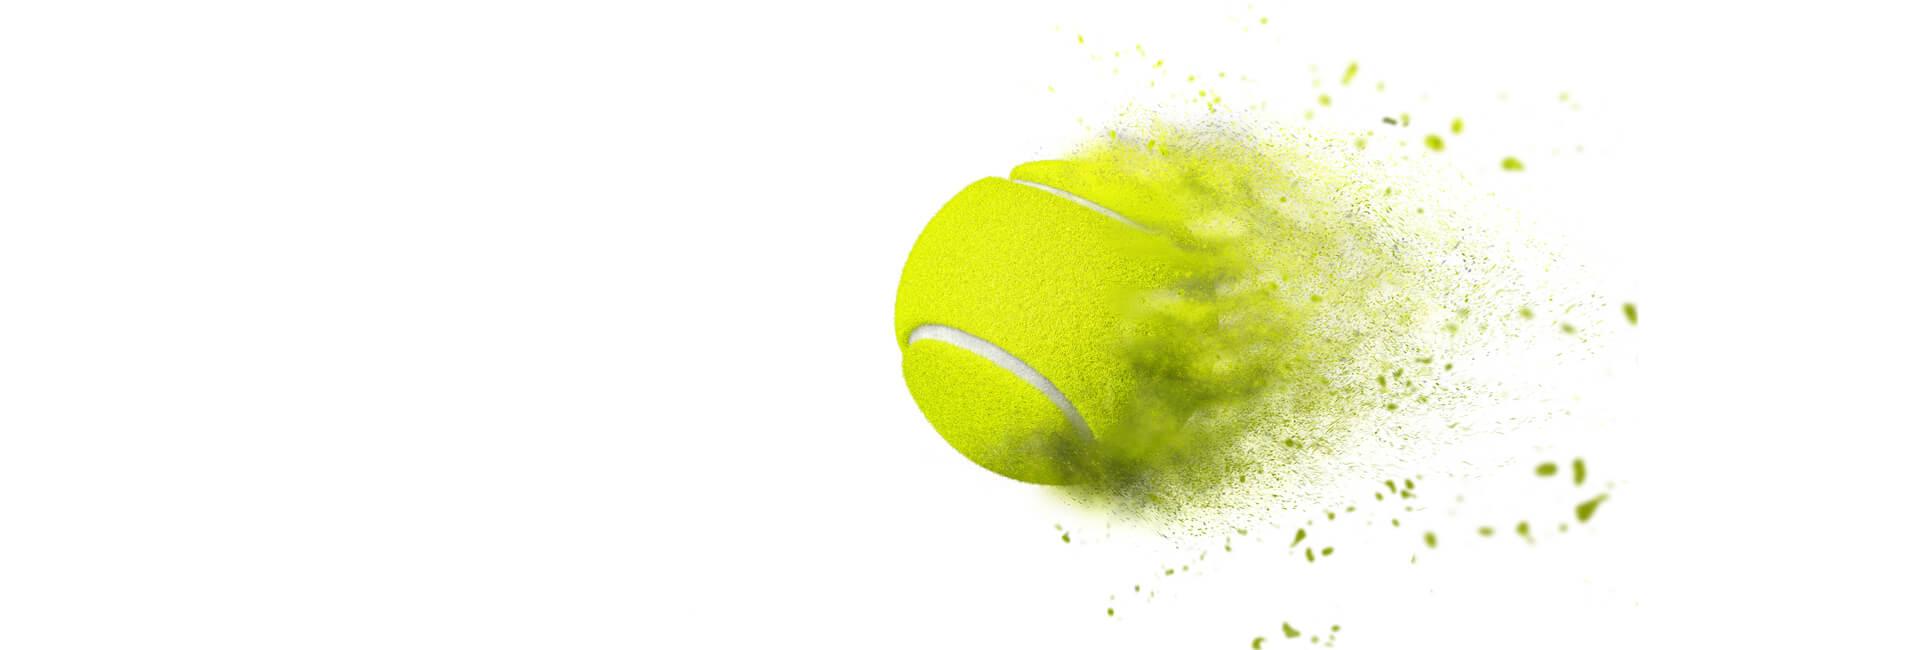 Trading strategies tennis